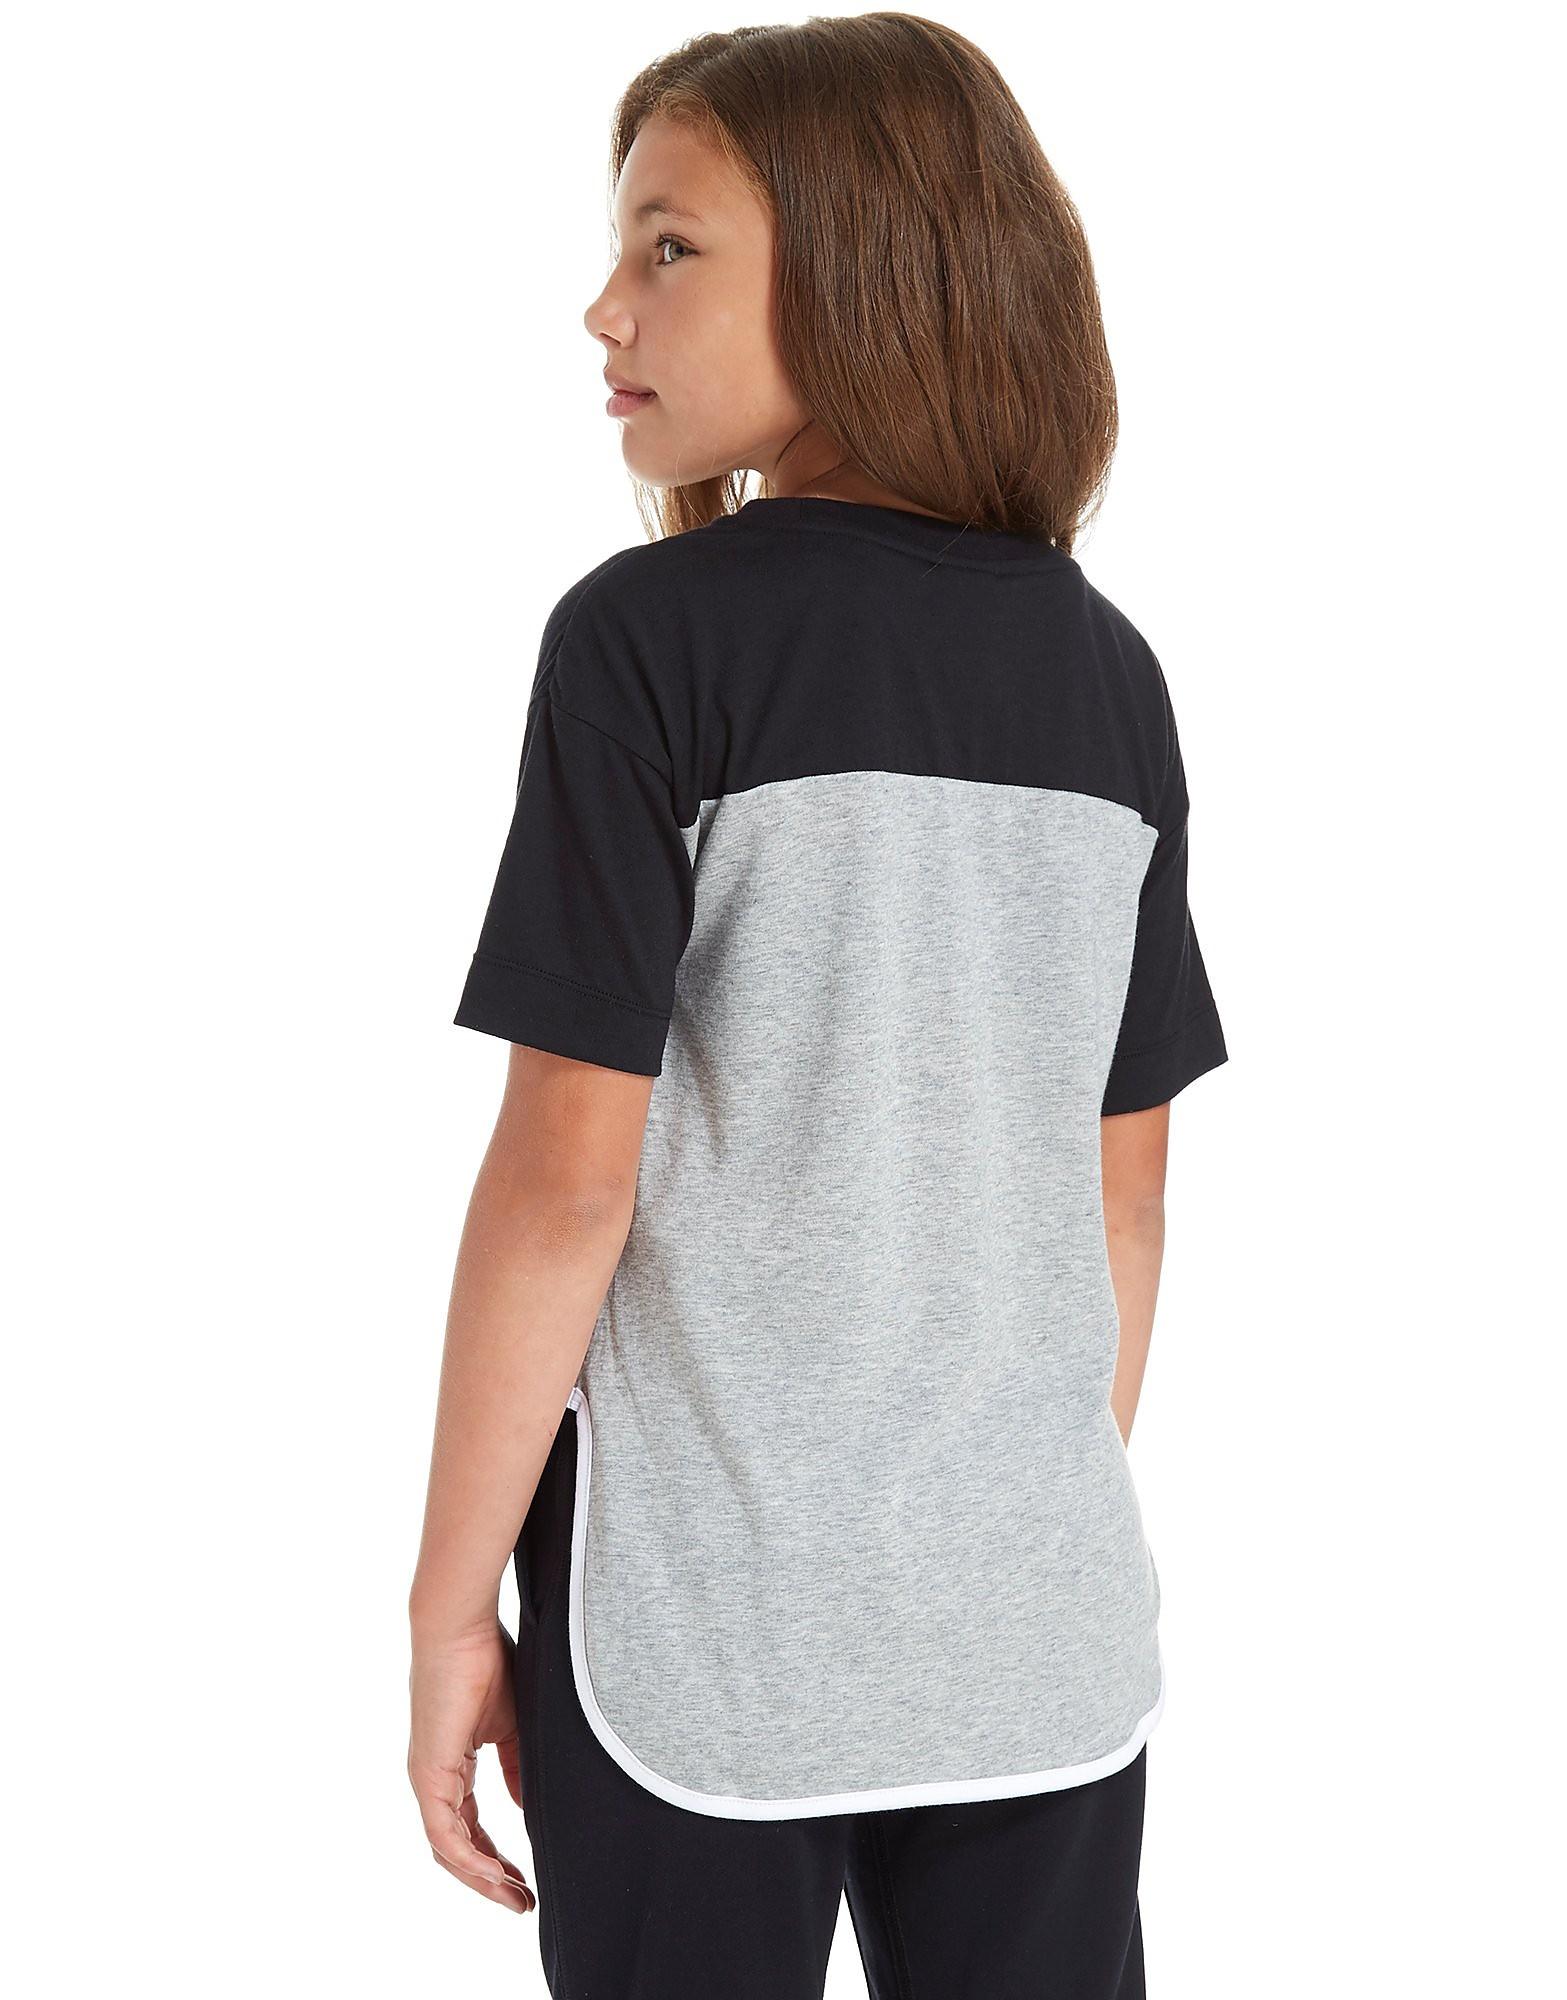 Nike Girls' Long Line T-Shirt Junior